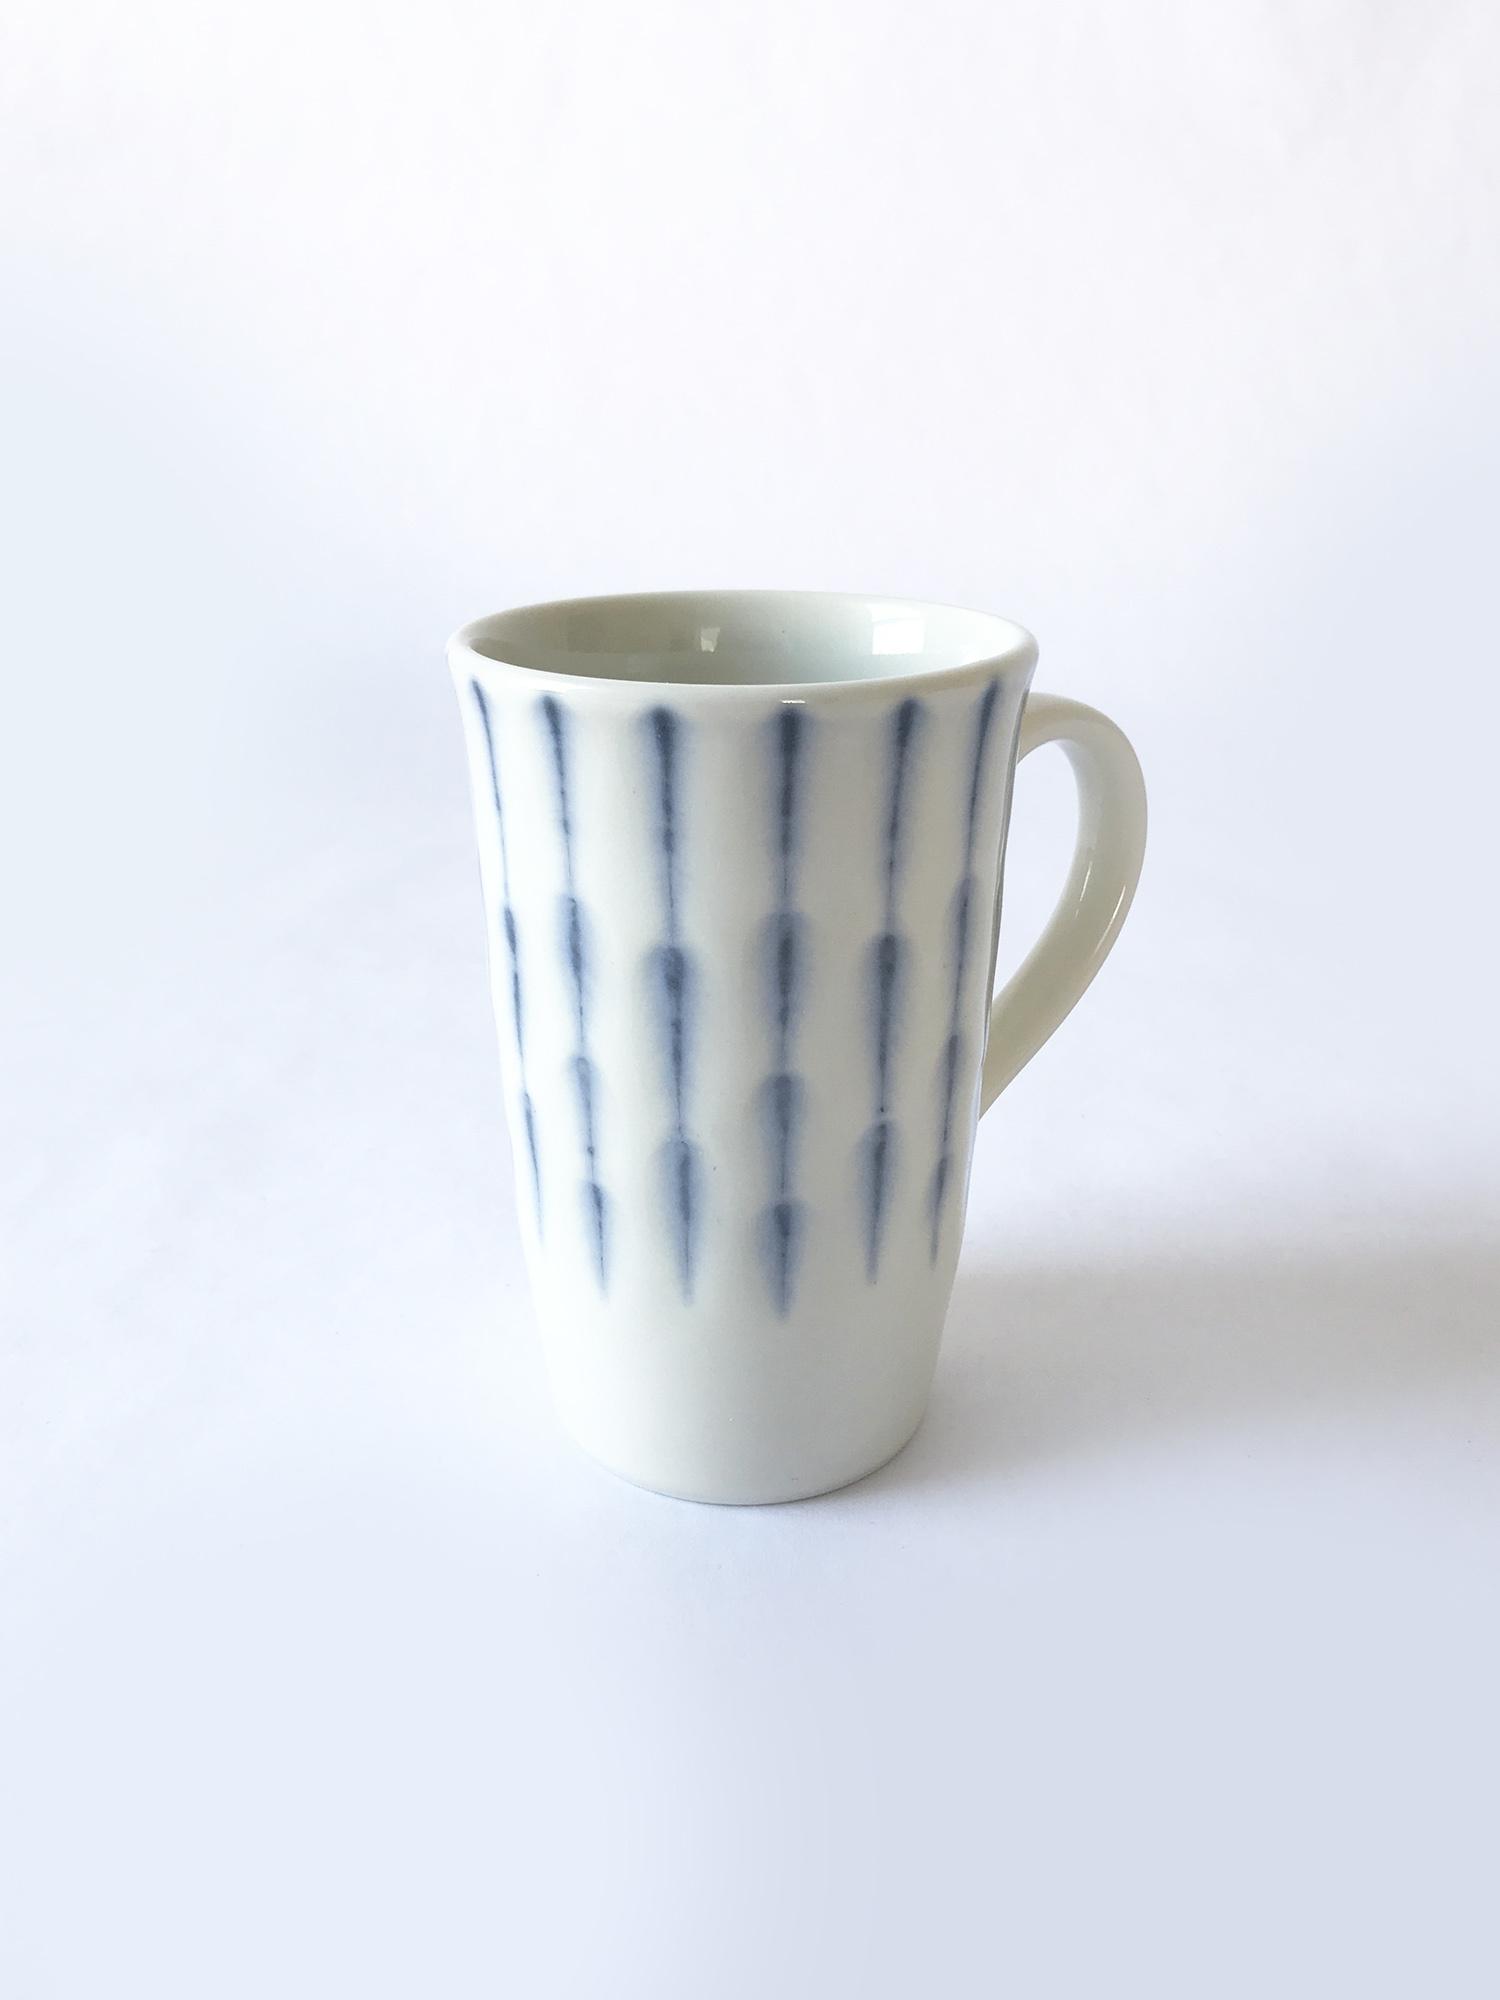 Miya Coffee Mug with Feathered Blue Stripes-1